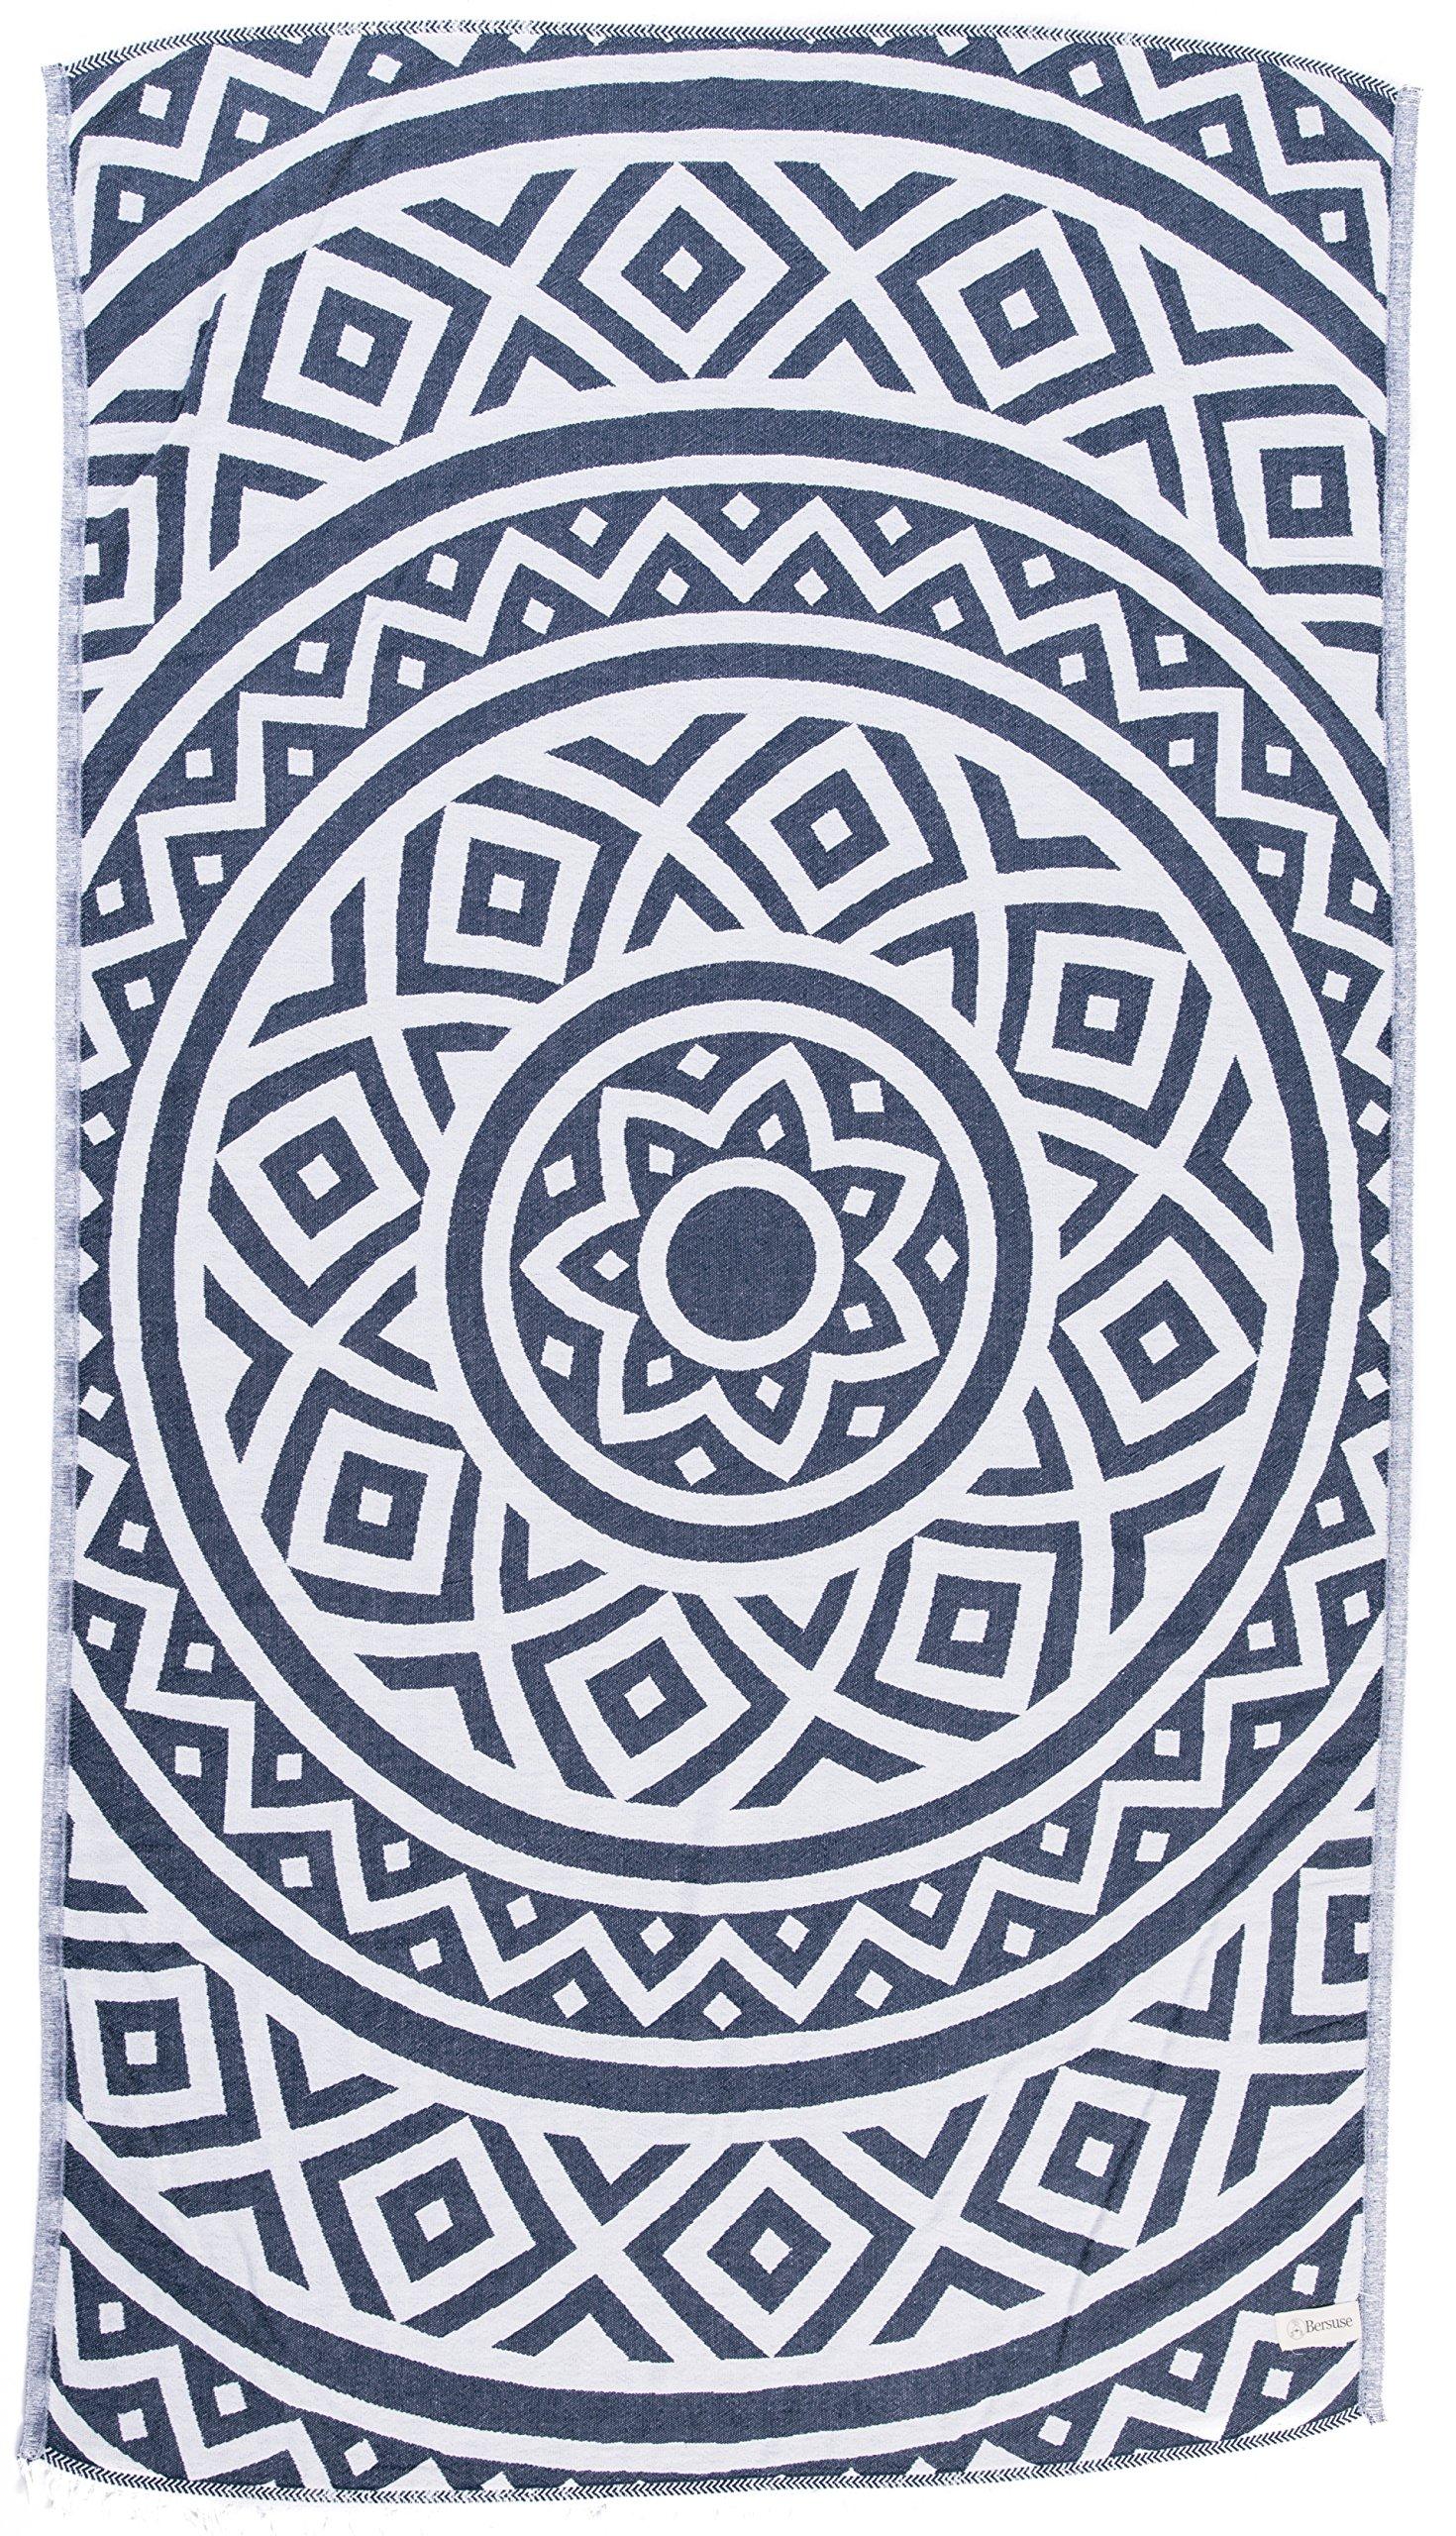 Bersuse 100% Cotton - Venice Turkish Towel - Bath Beach Fouta Peshtemal - Mandala Boho Hippie - Dual-Layer Handloom Pestemal - 39X71 Inches, Dark Blue (Set of 6)